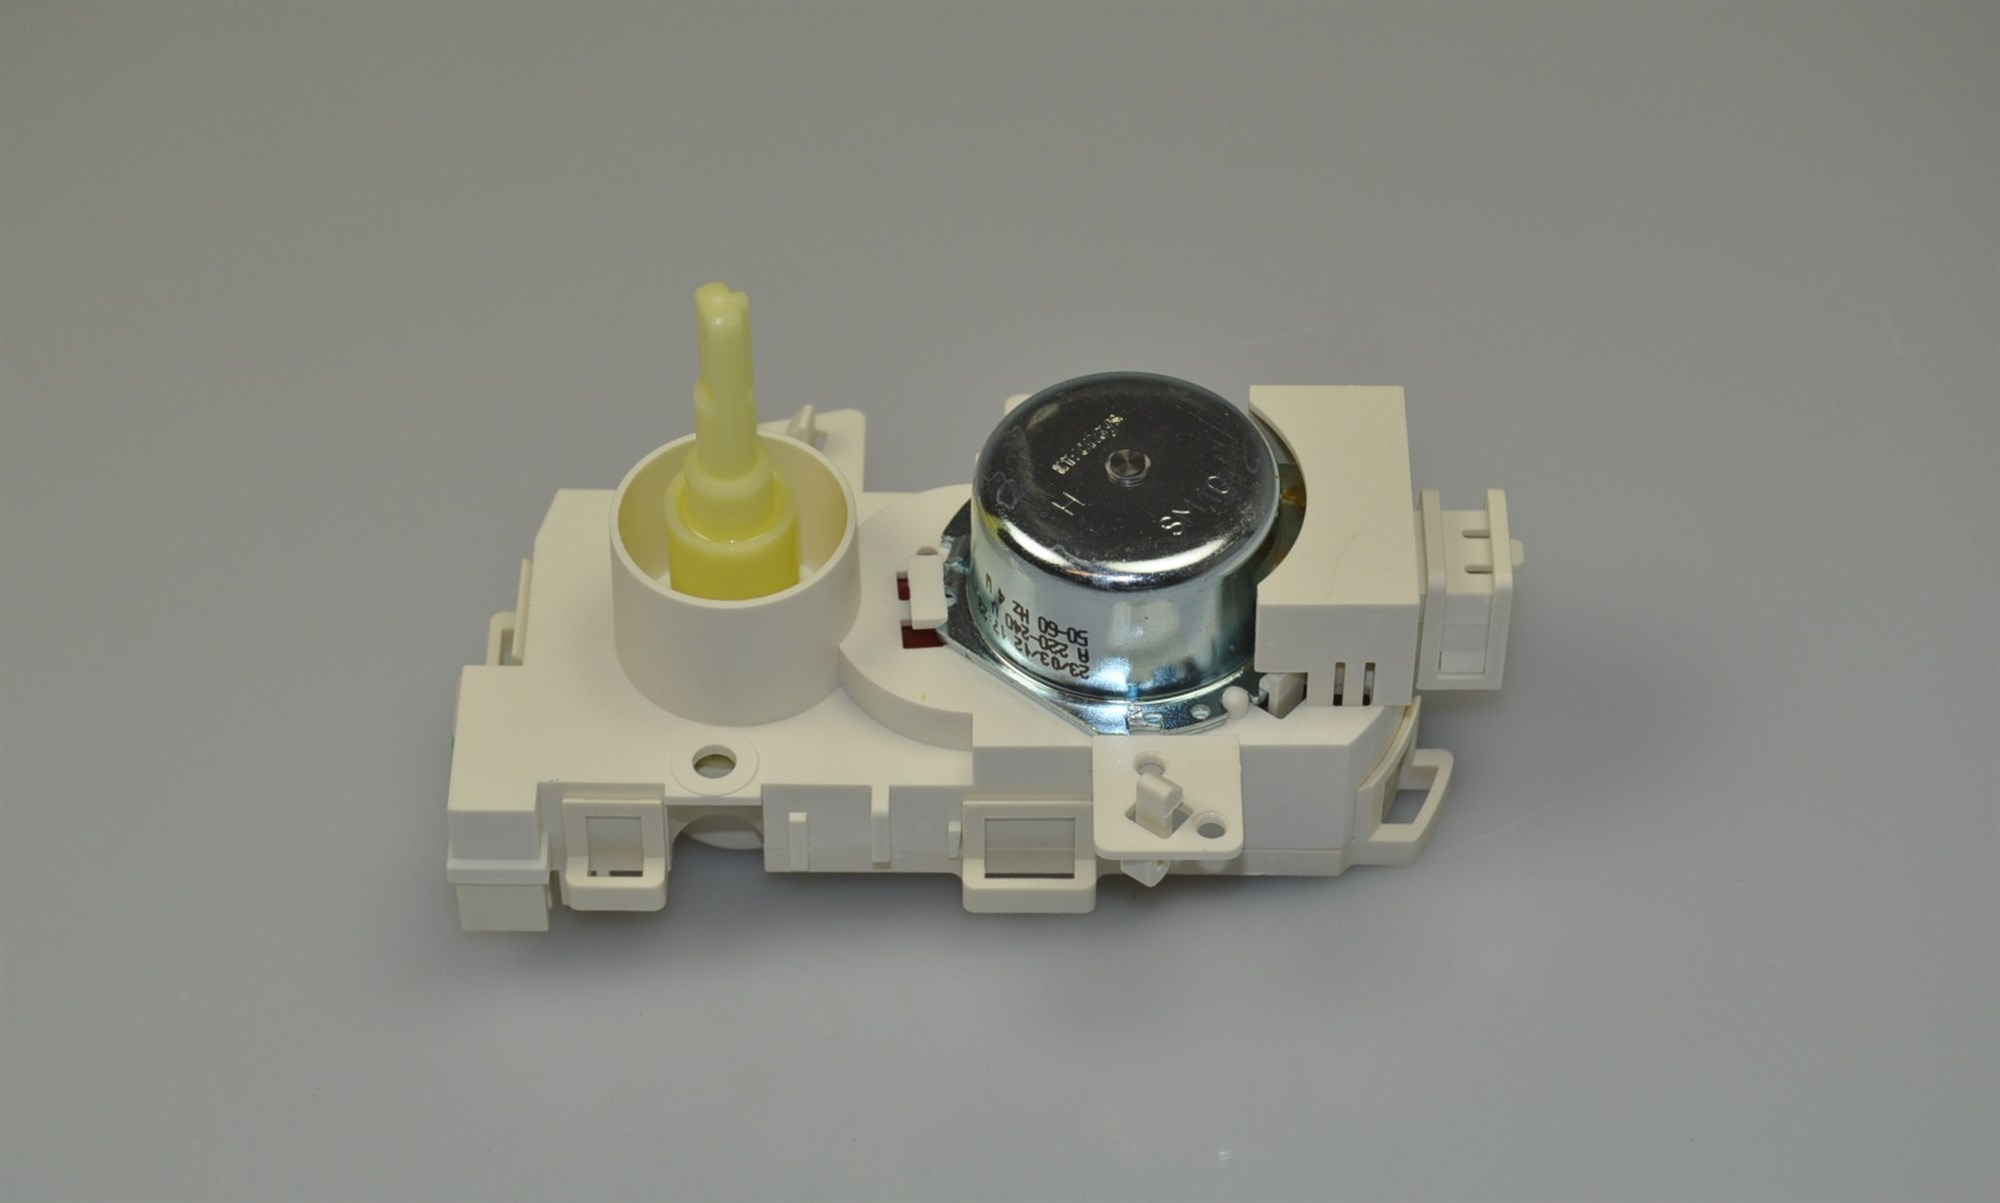 Diverter Valve Whirlpool Dishwasher